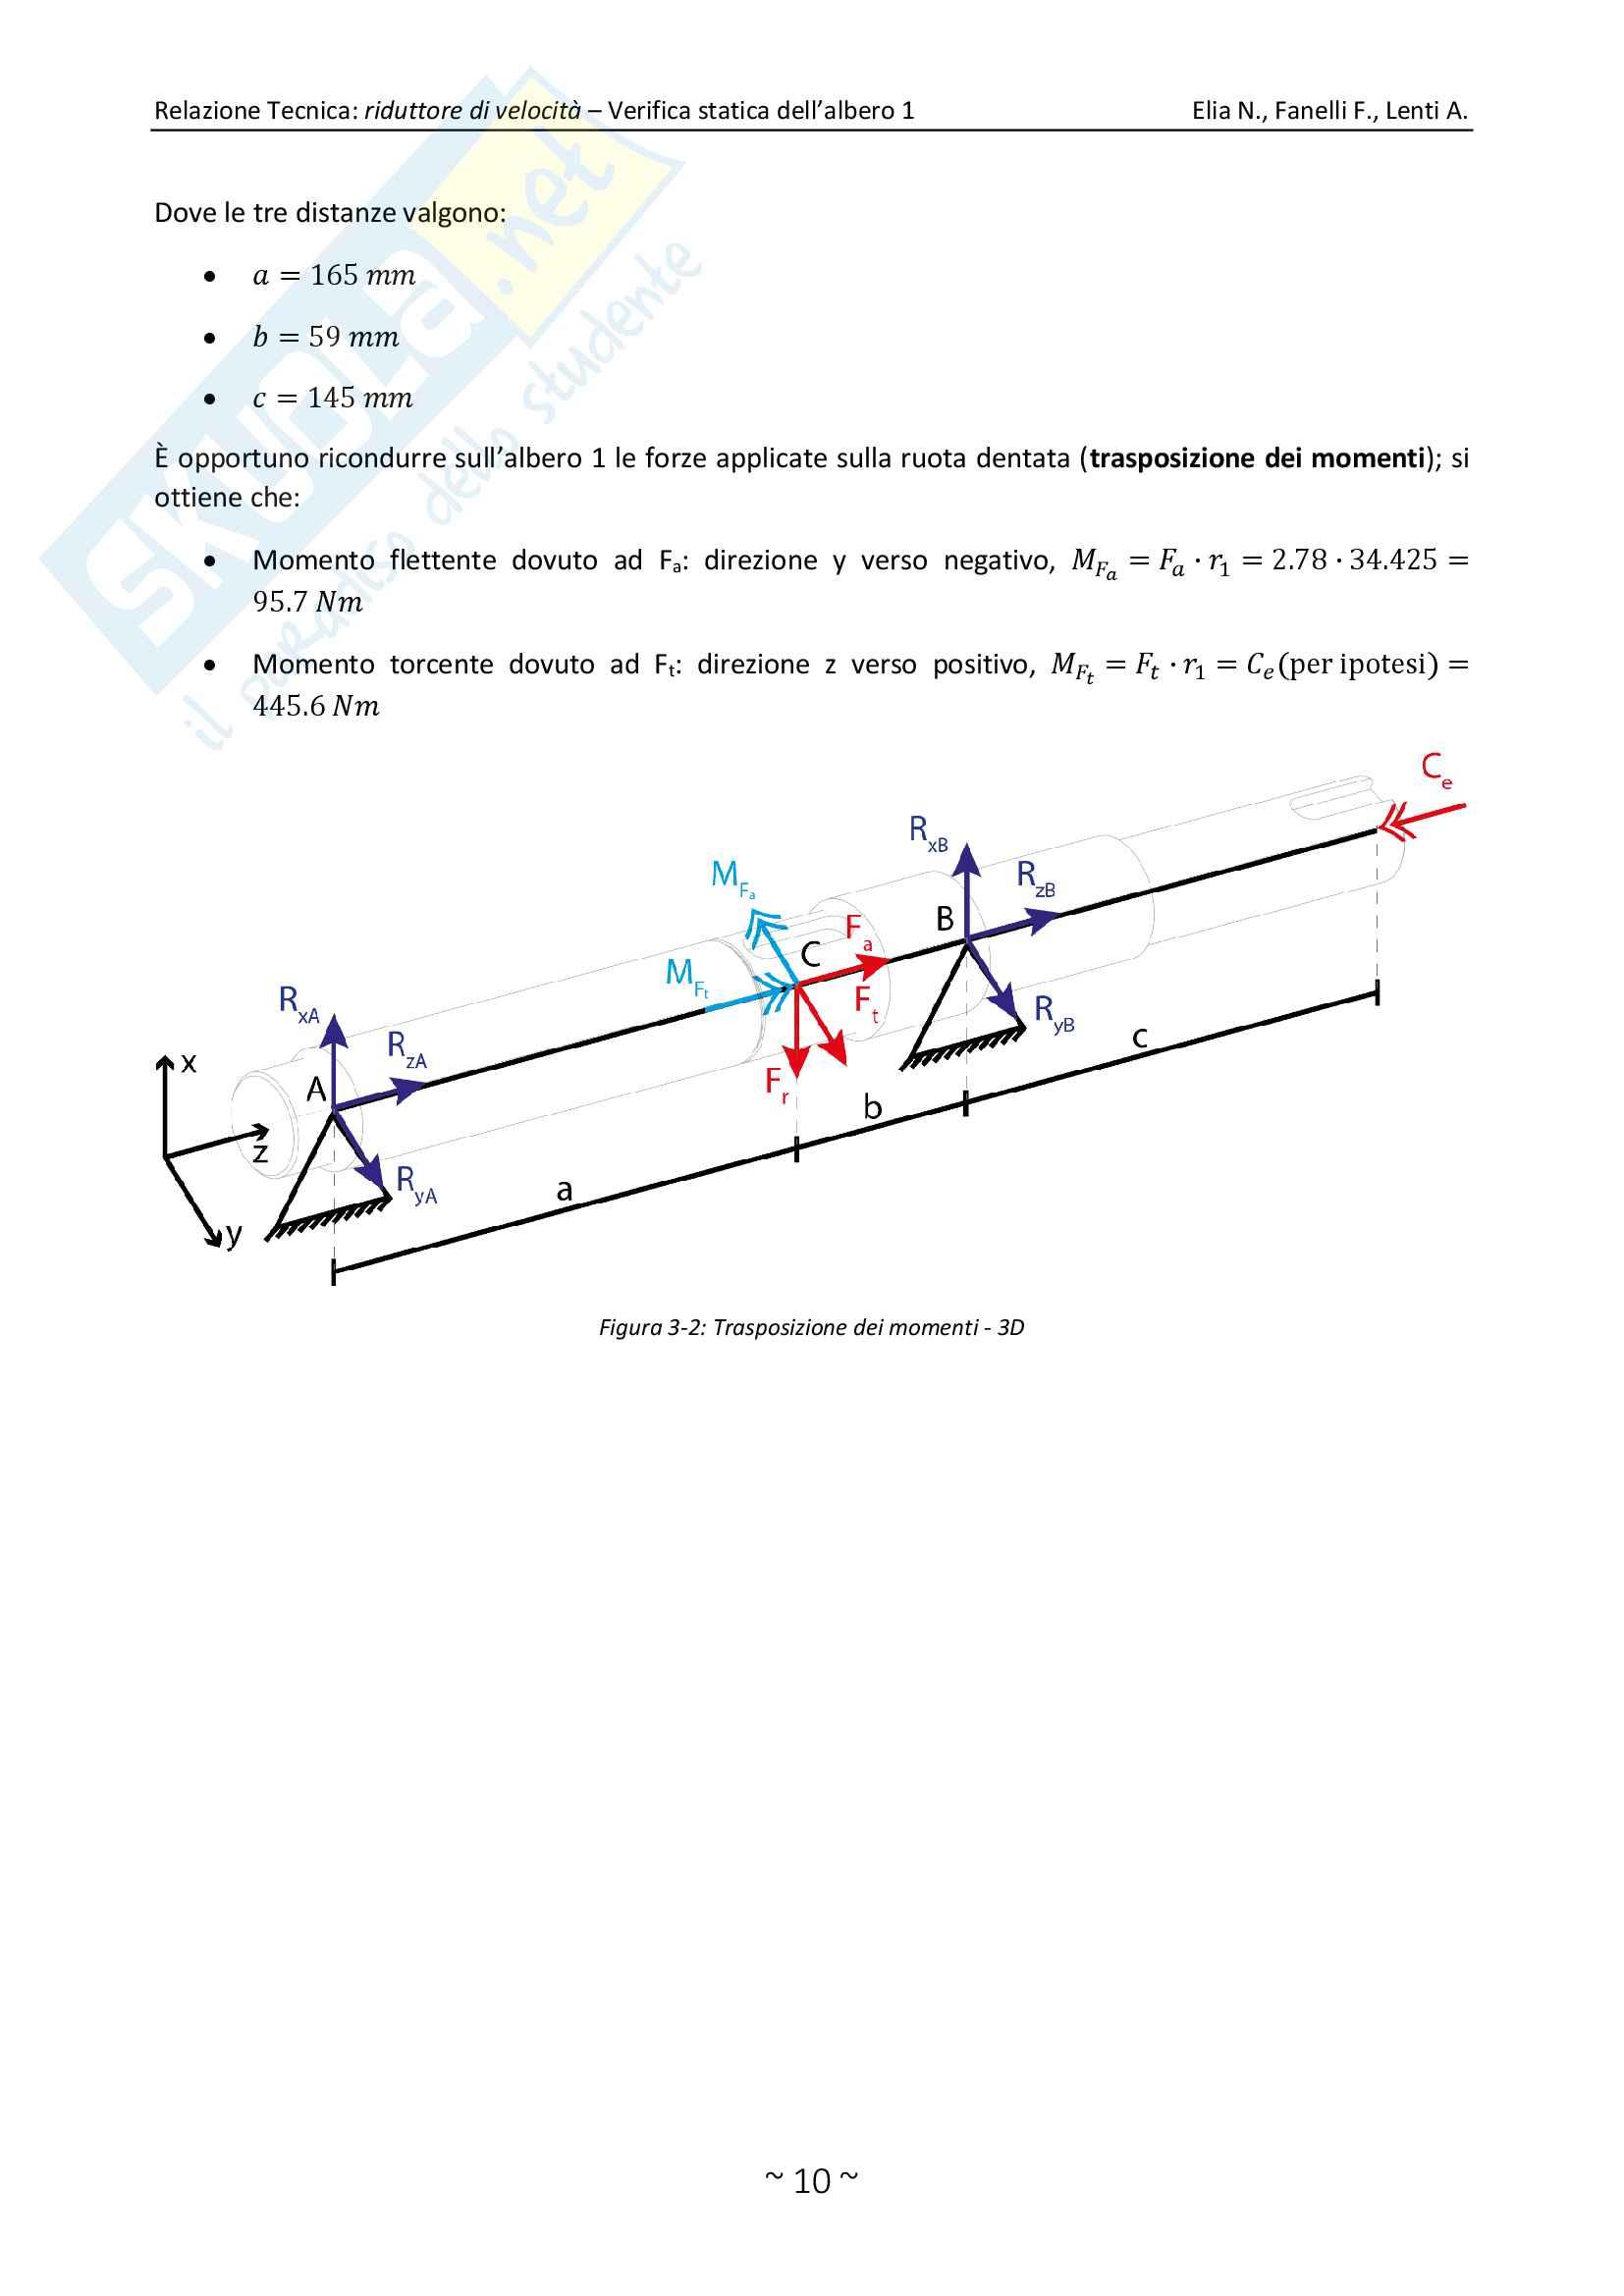 Relazione Tecnica Perfetta, Costruzione di Macchine, Berruti, Brusa Pag. 11